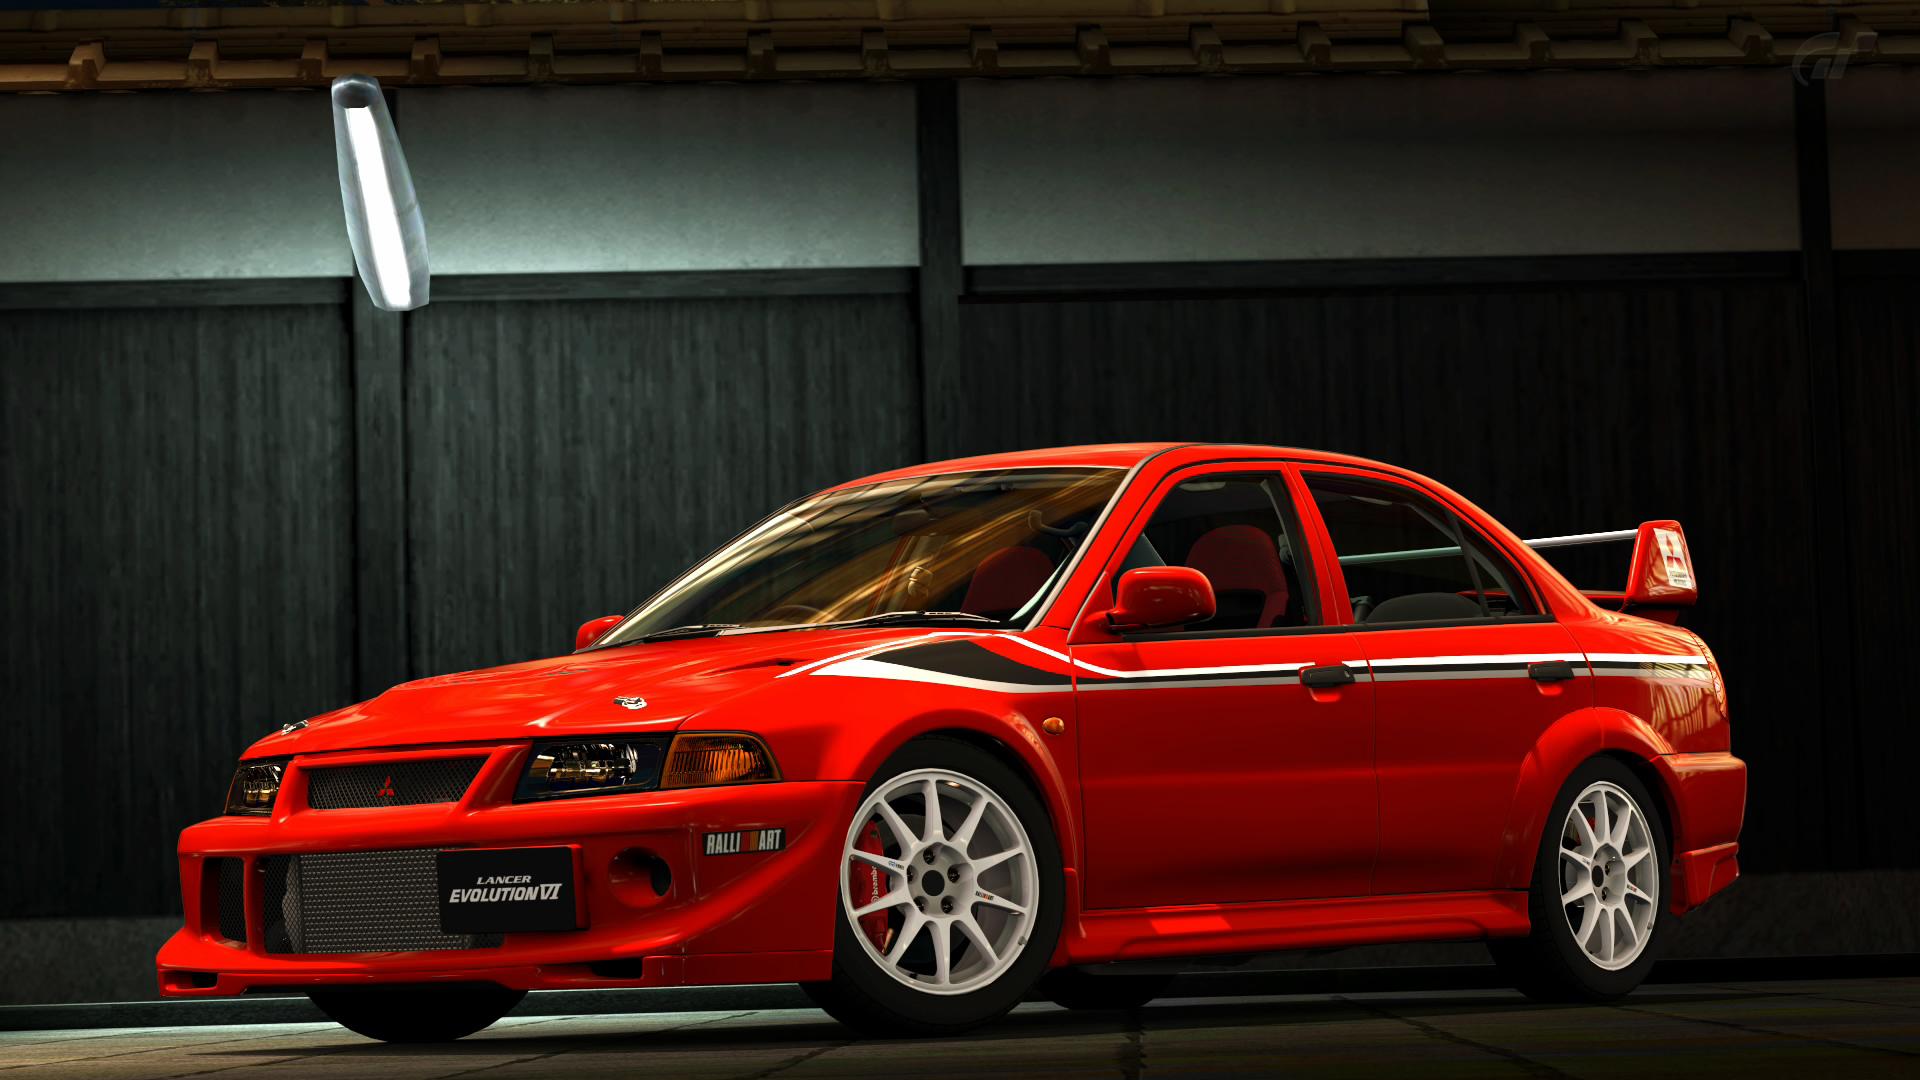 Mitsubishi carisma evo vi